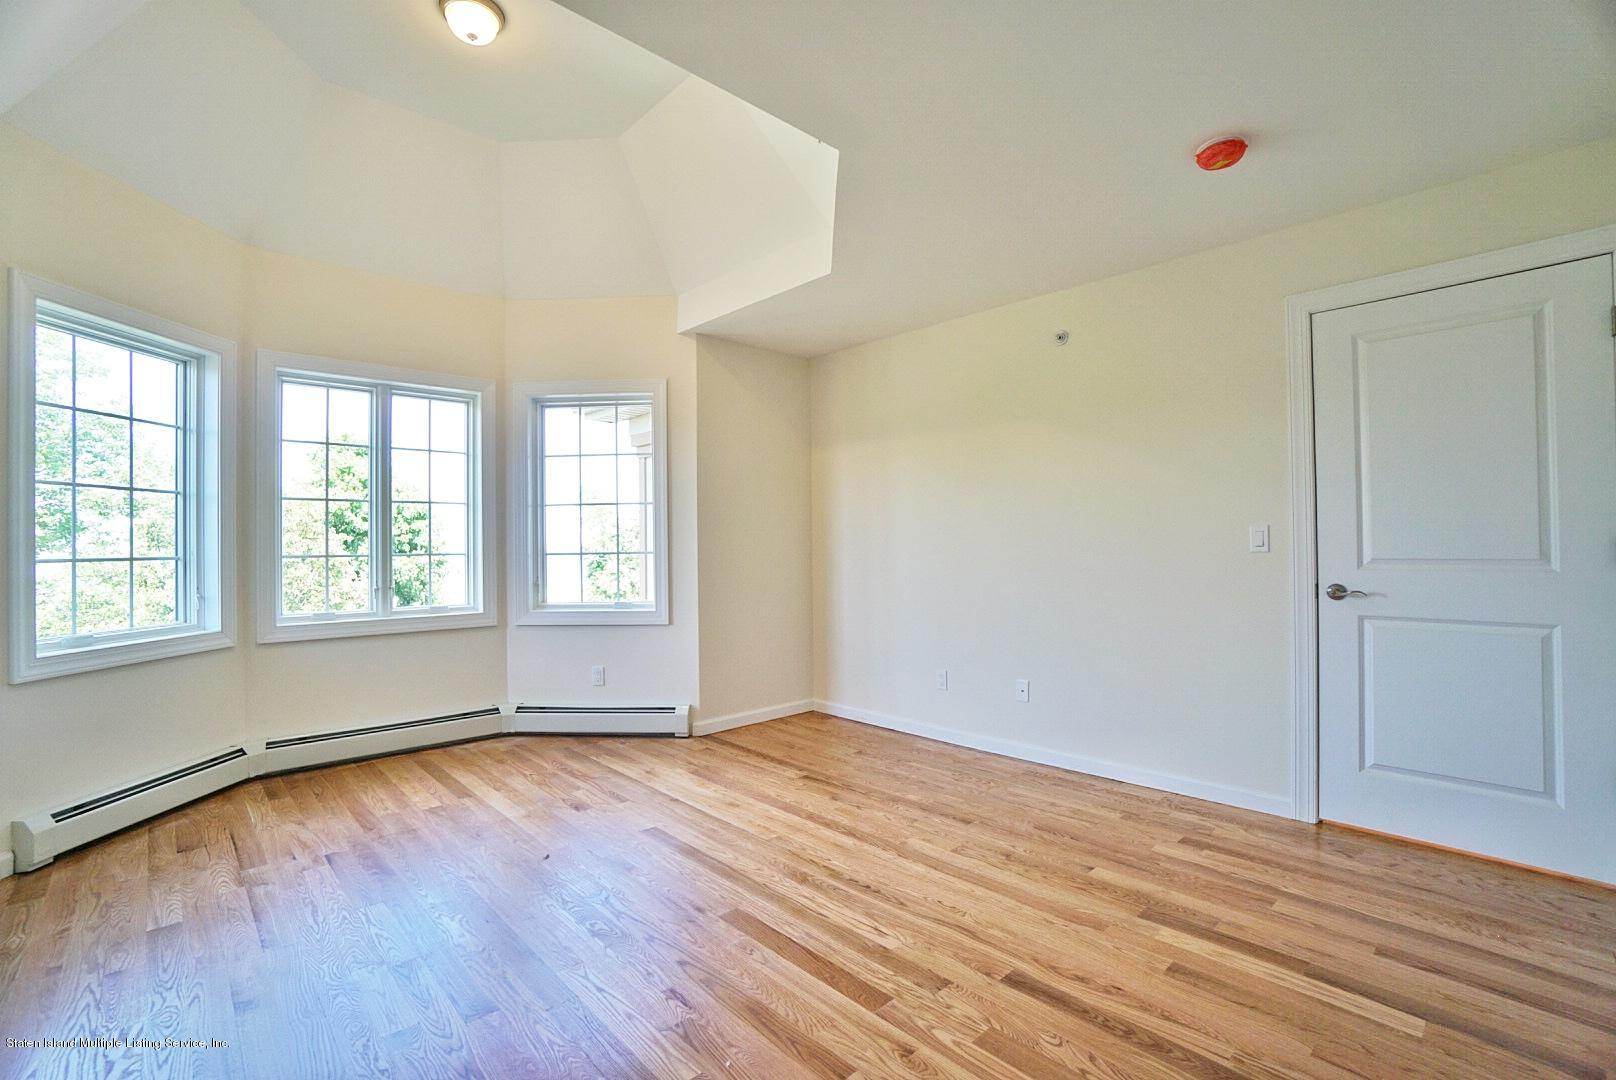 Single Family - Detached 678 Yetman Avenue  Staten Island, NY 10307, MLS-1132766-40